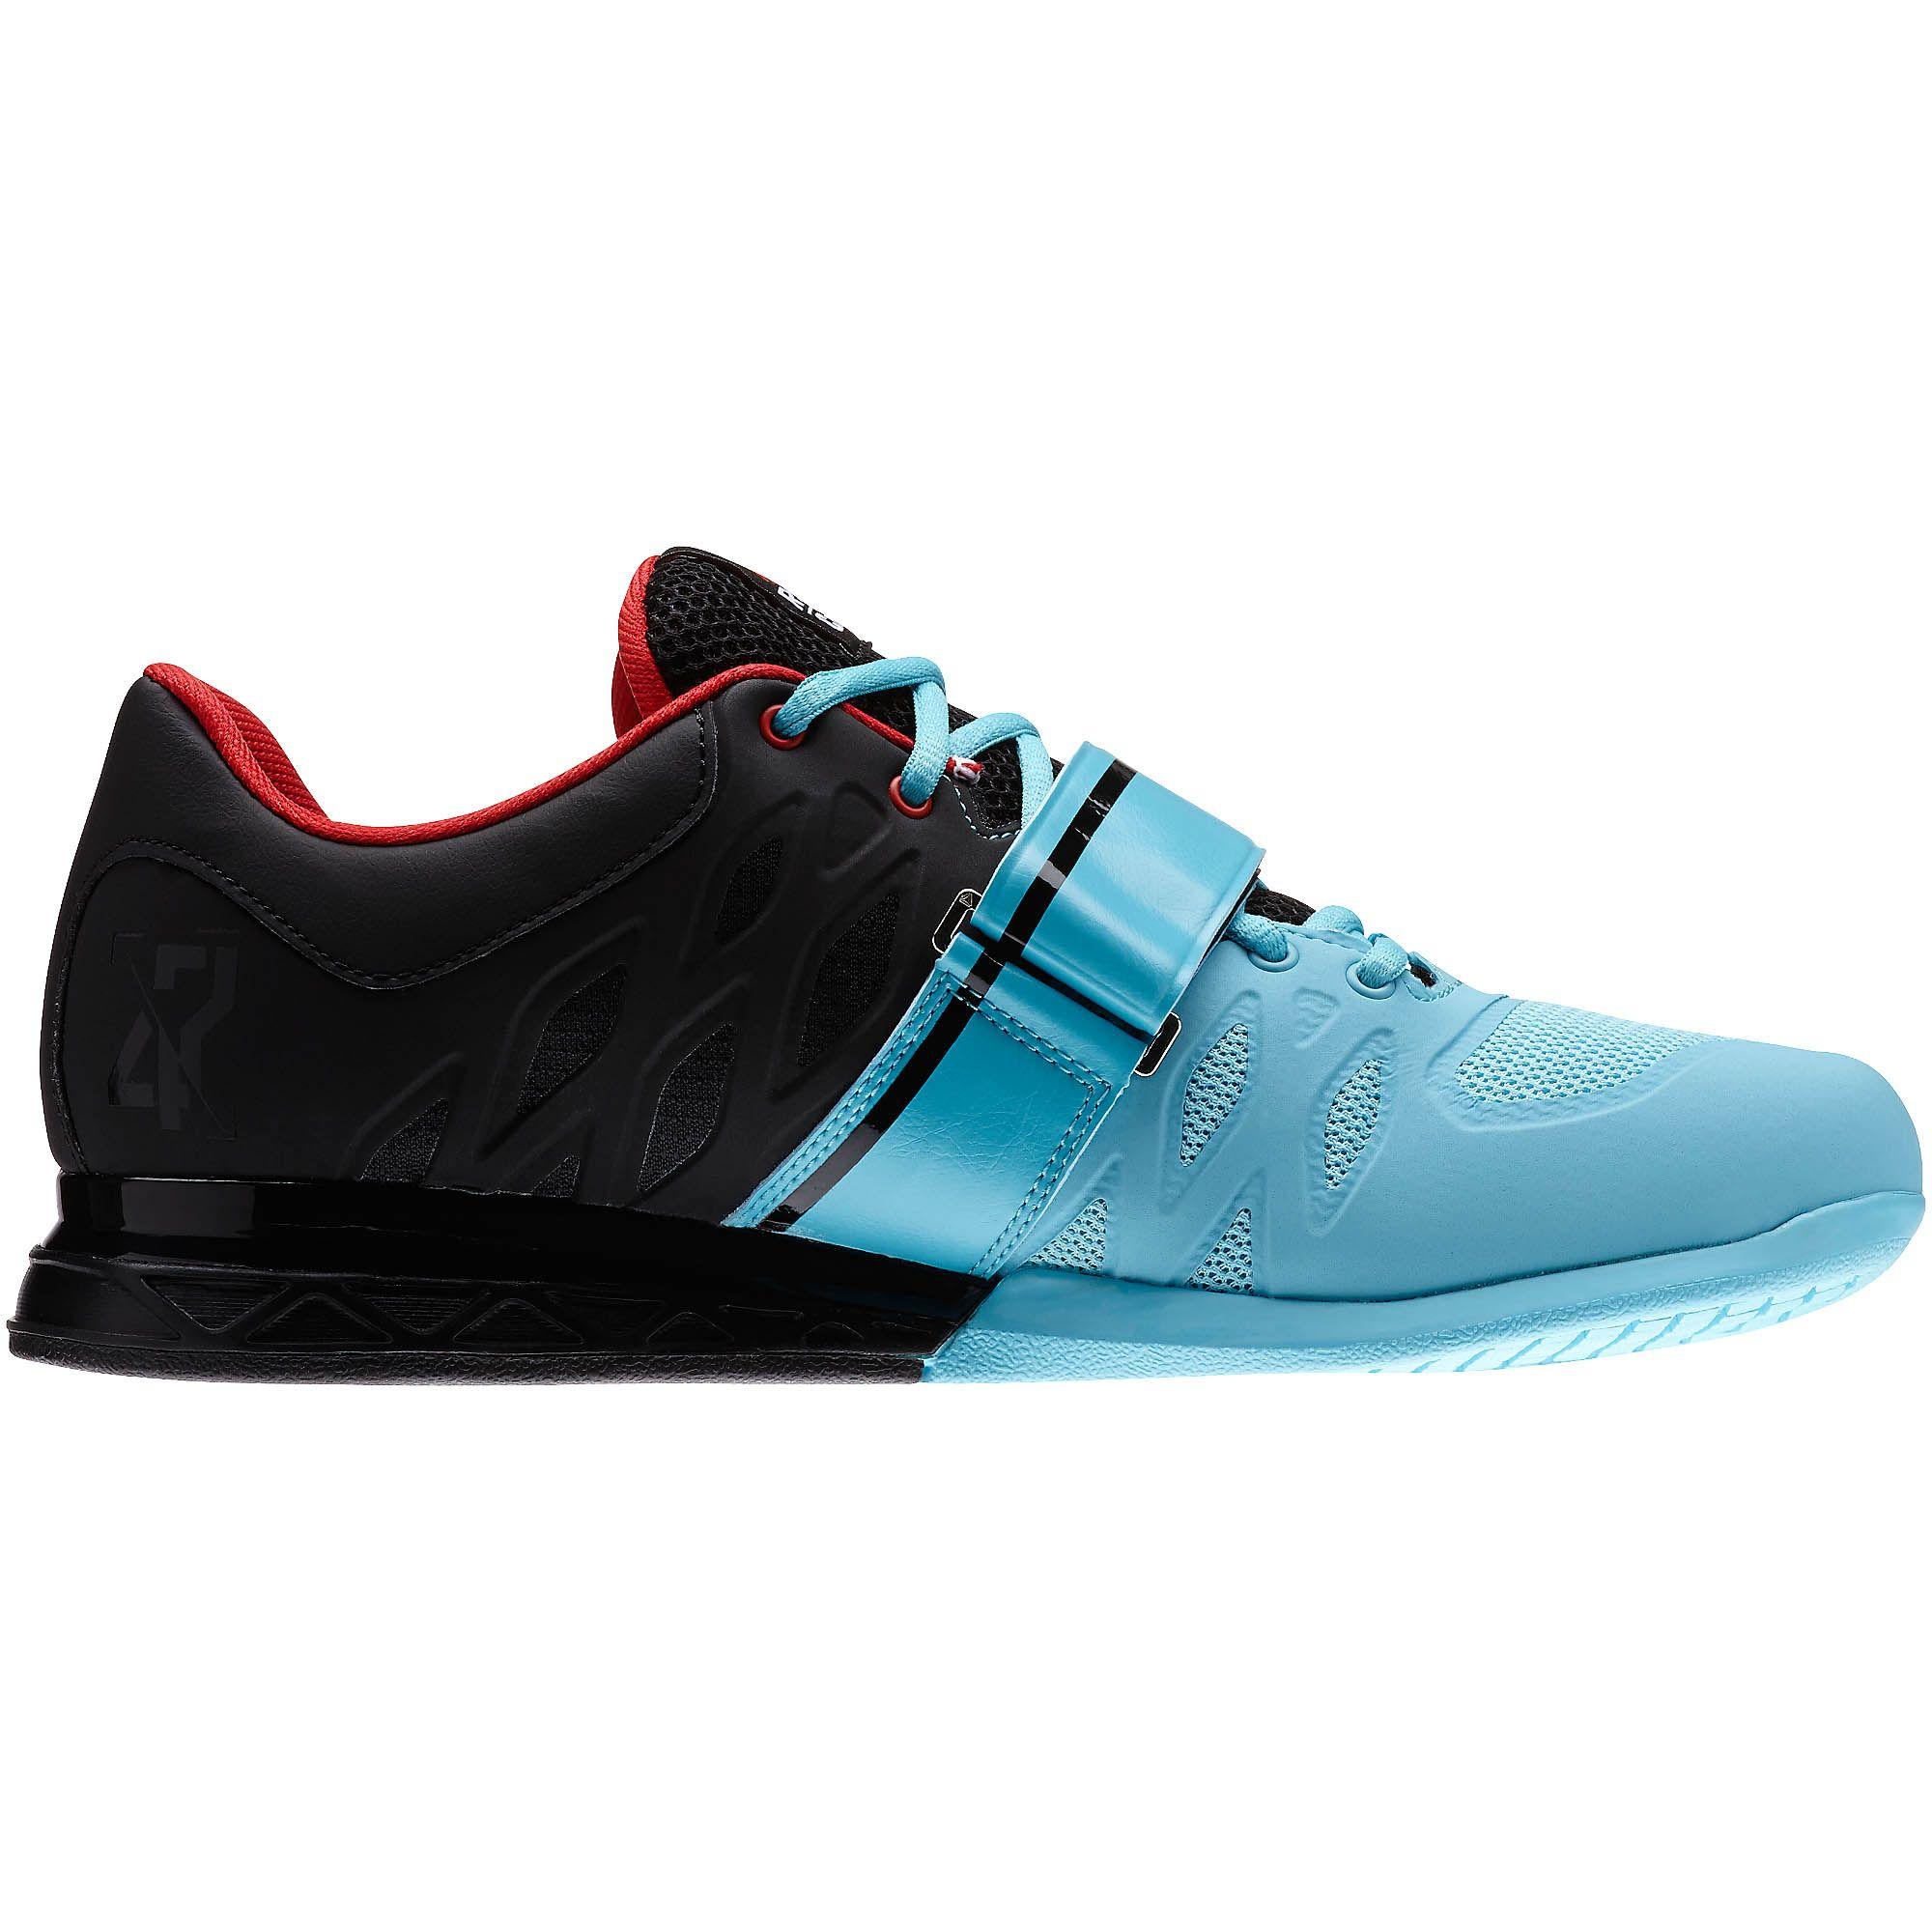 2274f07e19f crossfit schoenen cheap > OFF75% The Largest Catalog Discounts